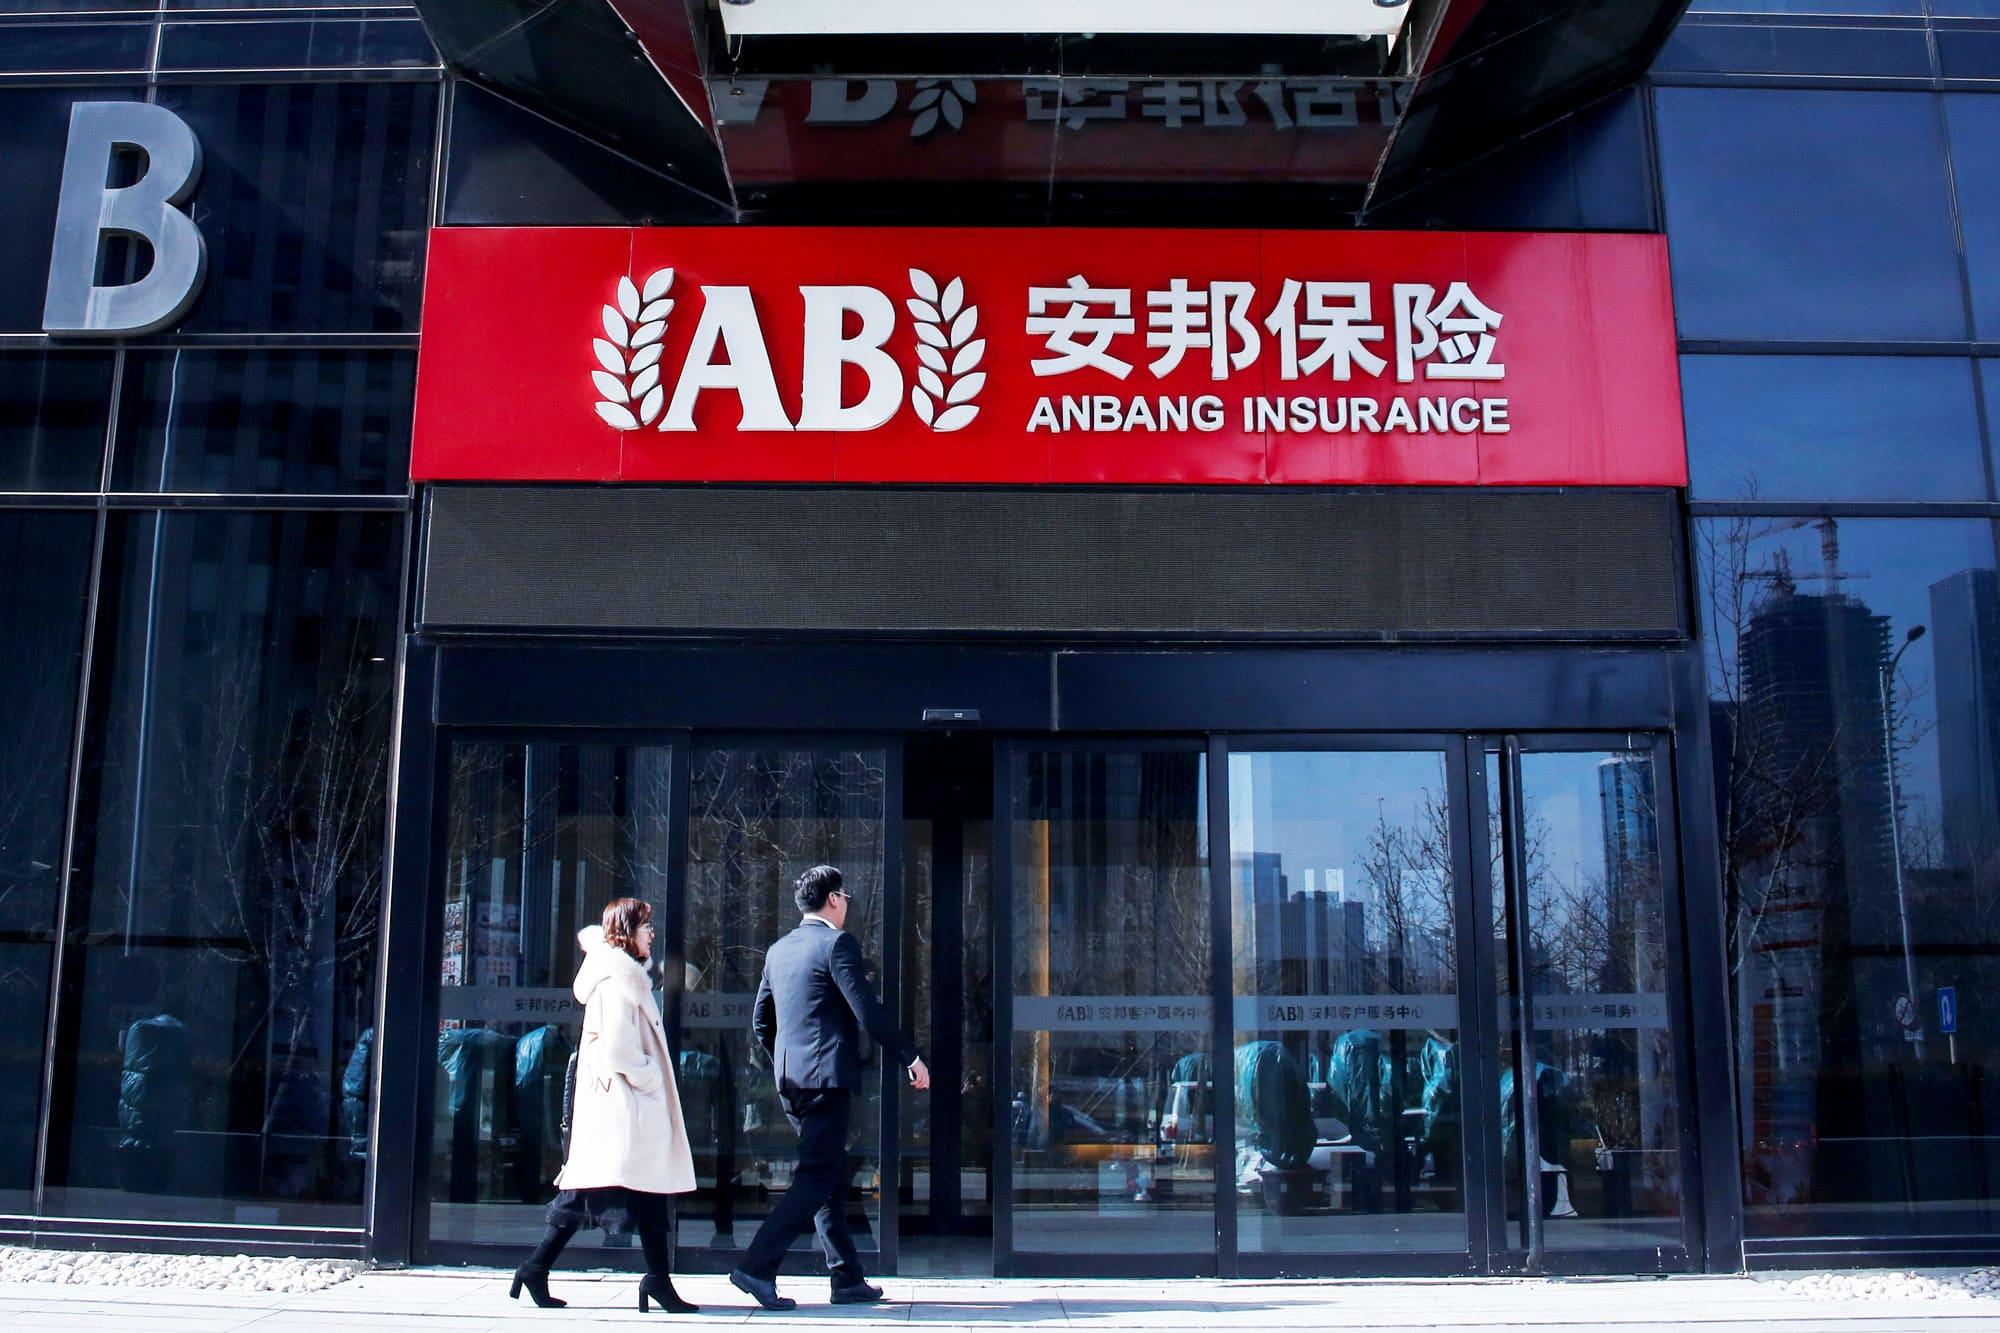 China's Anbang is said to plan sale of entire $2.4 billion Japanese property portfolio